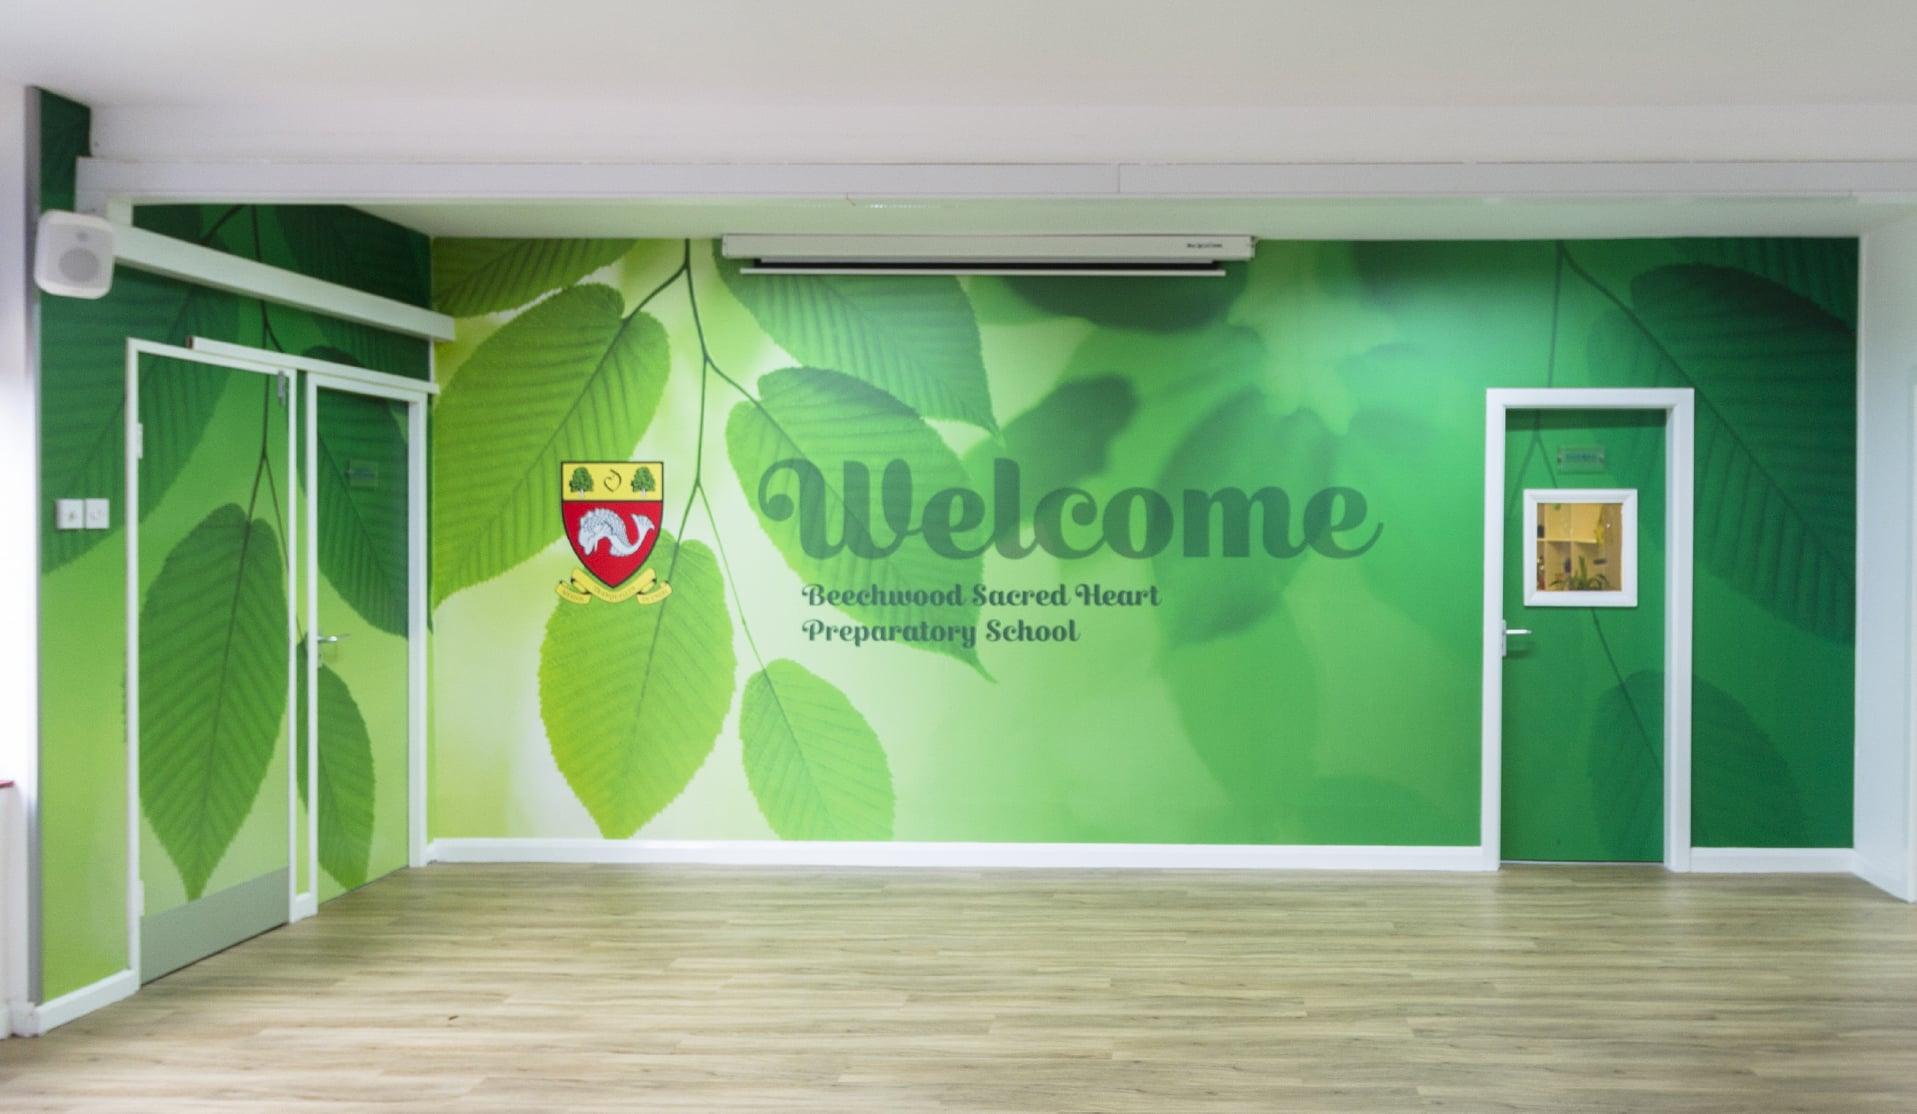 Bespoke School entrance area welcoming wall art feature